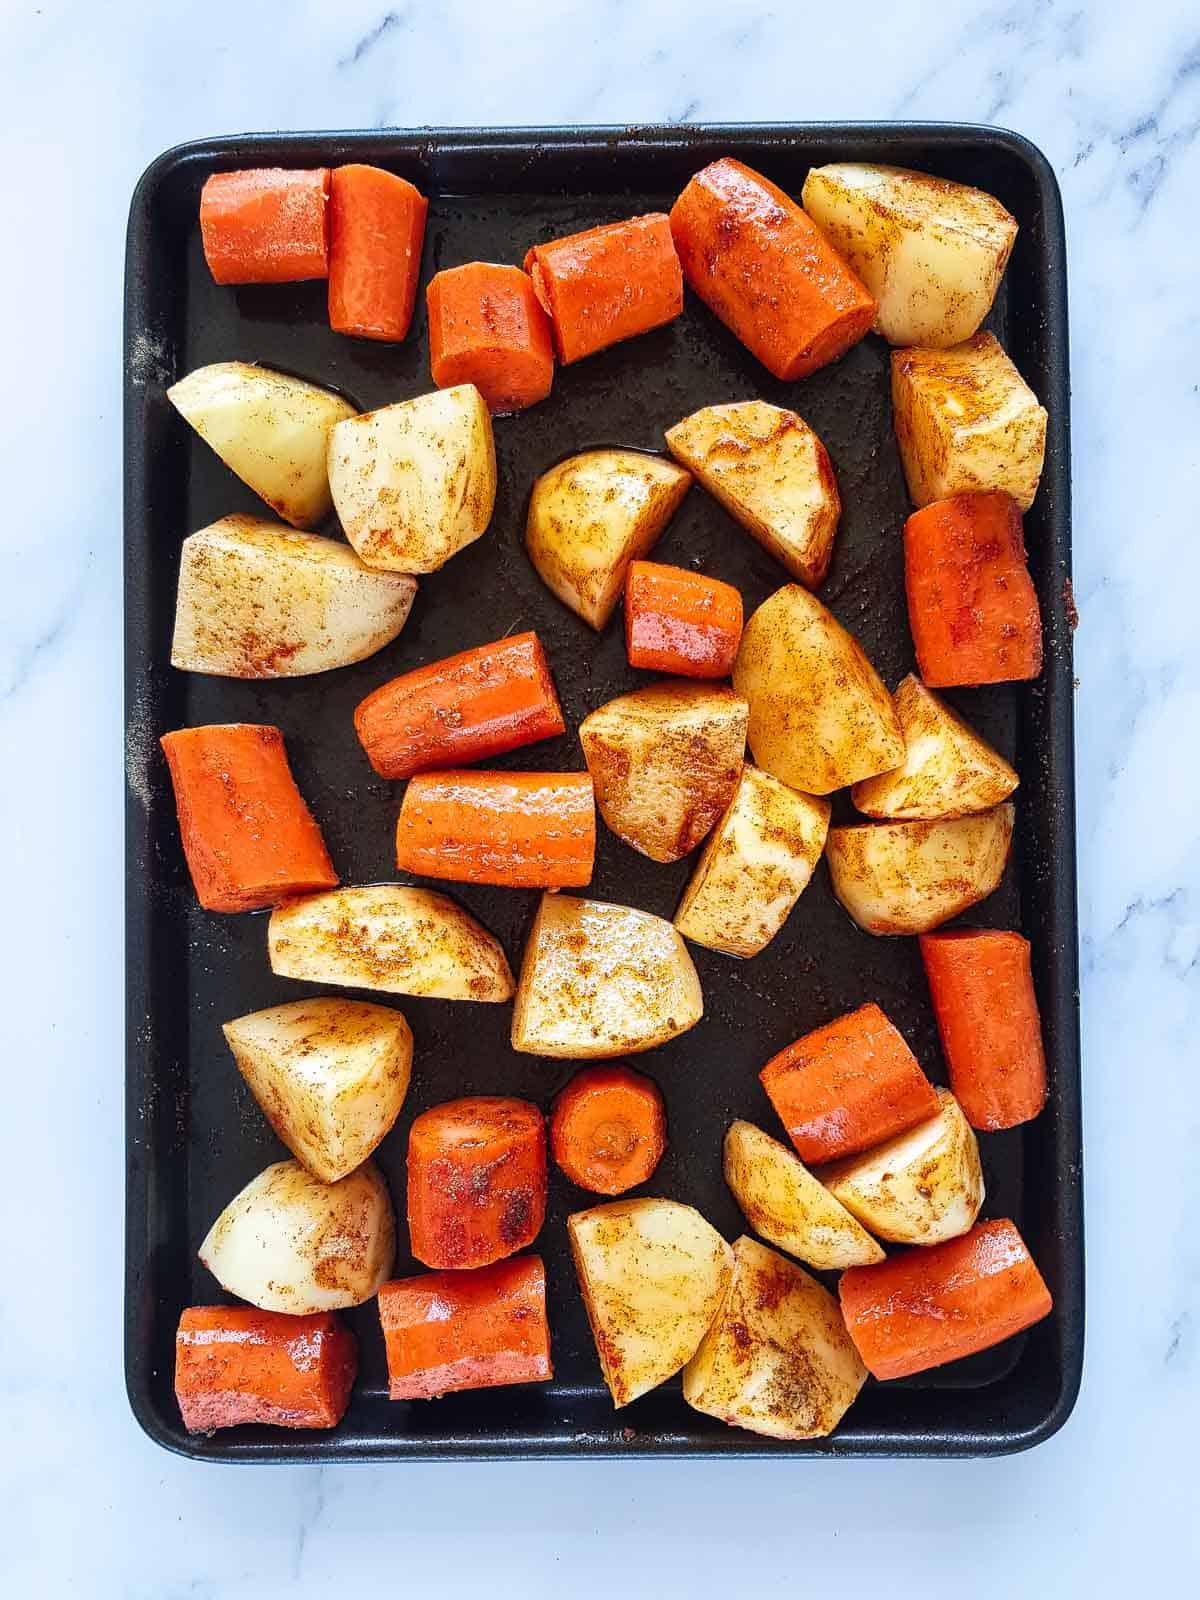 Seasoned carrots and potatoes on a roasting tray.